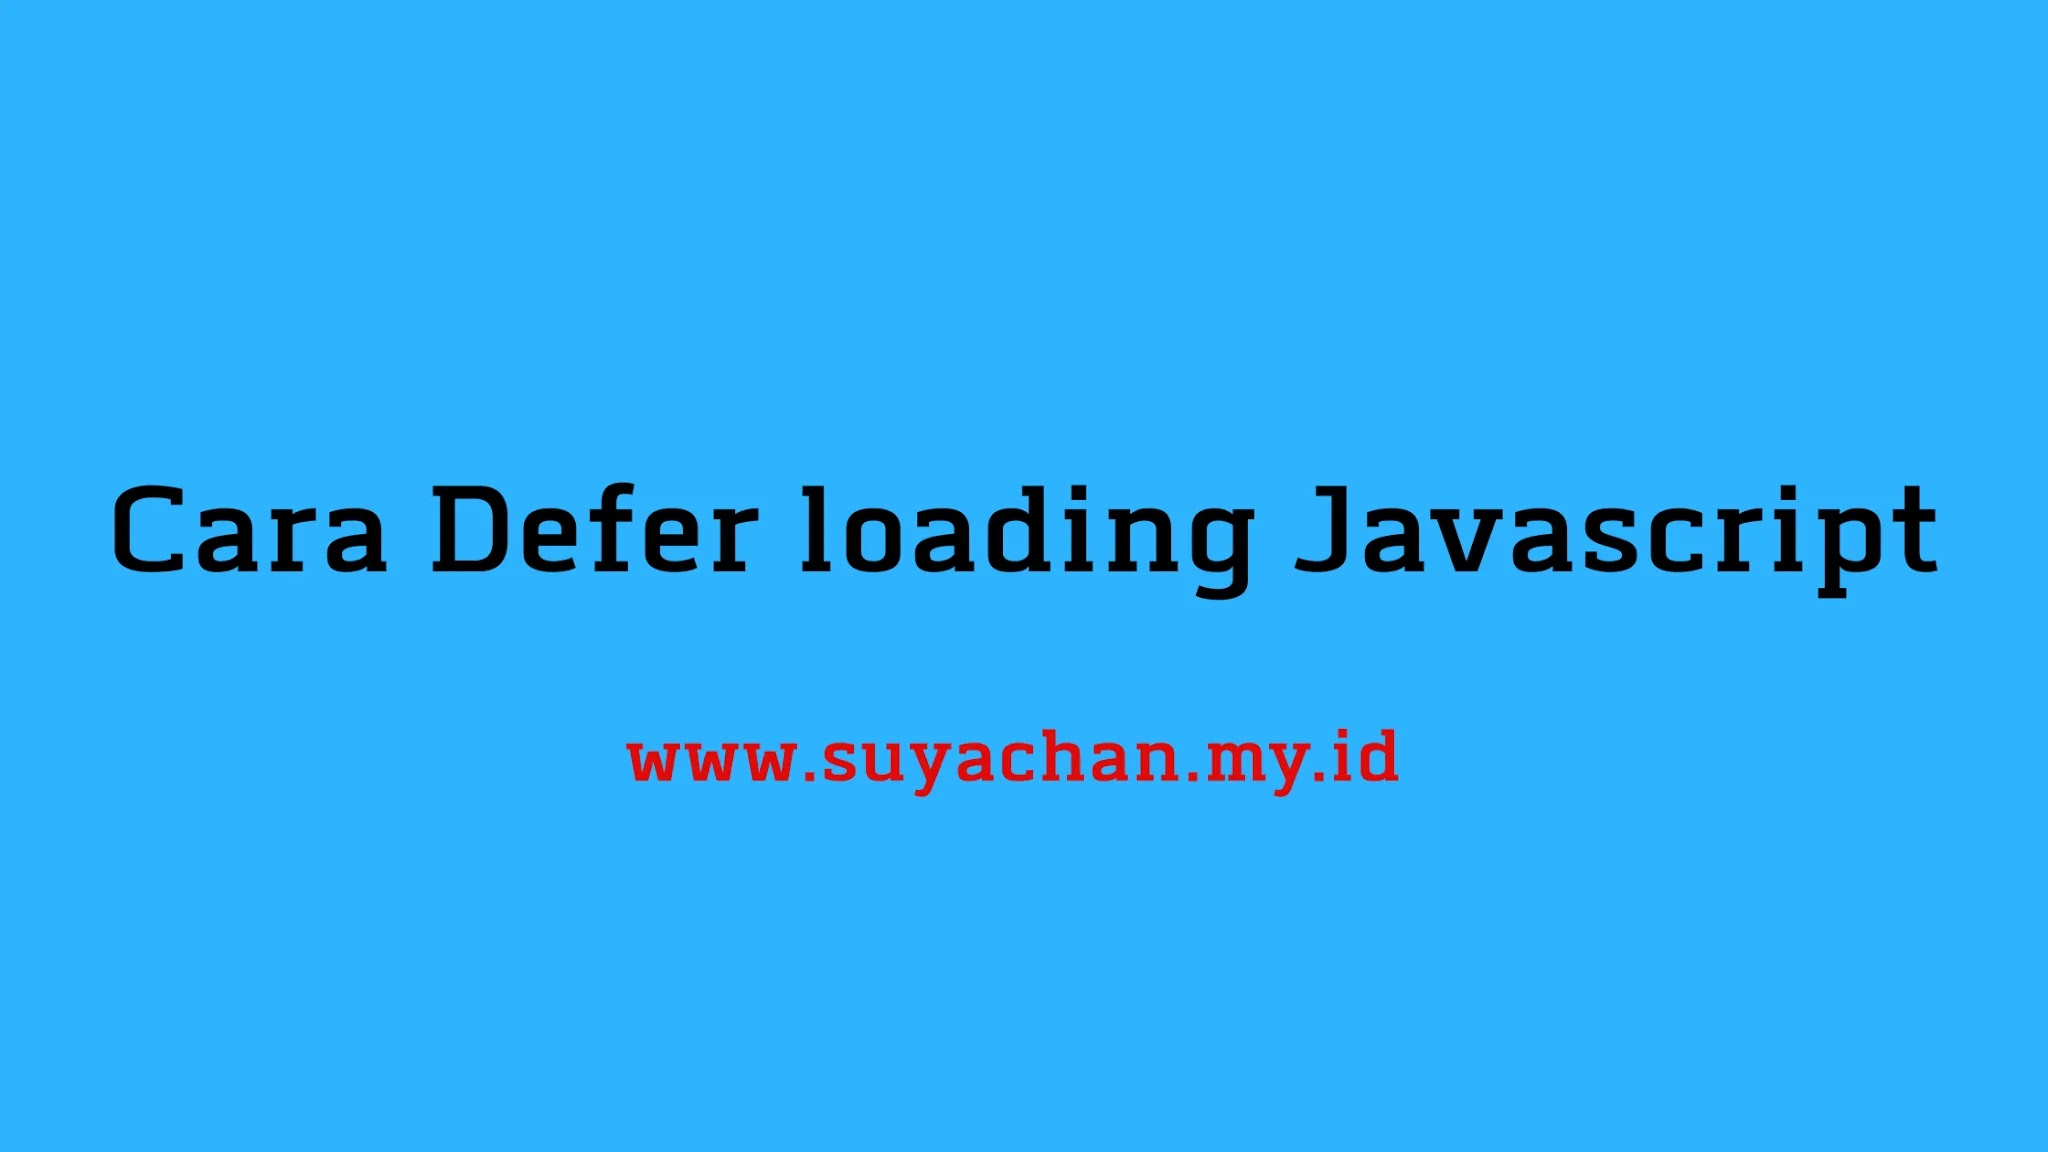 Cara Defer loading Javascript